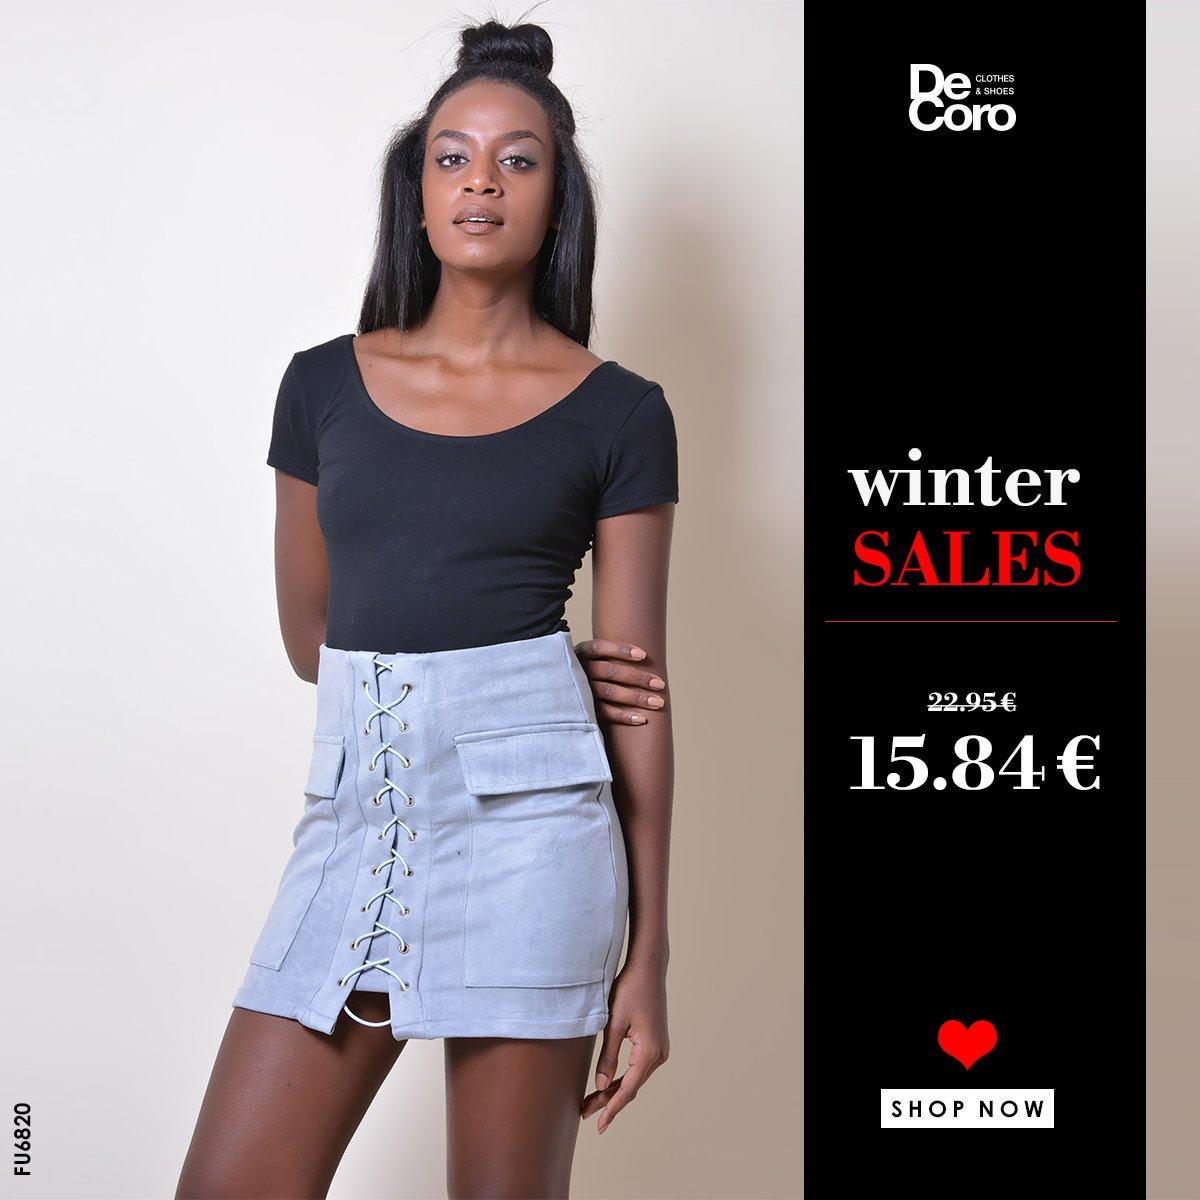 mmm... What a Cute Suede Skirt 😘  Τιμή: €15.84!! | Φούστα Suede Ψηλόμεση με Διακοσμητικό Δέσιμο & Τσέπες  | κωδ. FU6820 __________________________ 🚚 Δωρεάν Αποστολή & Αλλαγή Shop Online |  ☎️ 2310 555520 #clothes #skrit #sales #DeCoro #suede